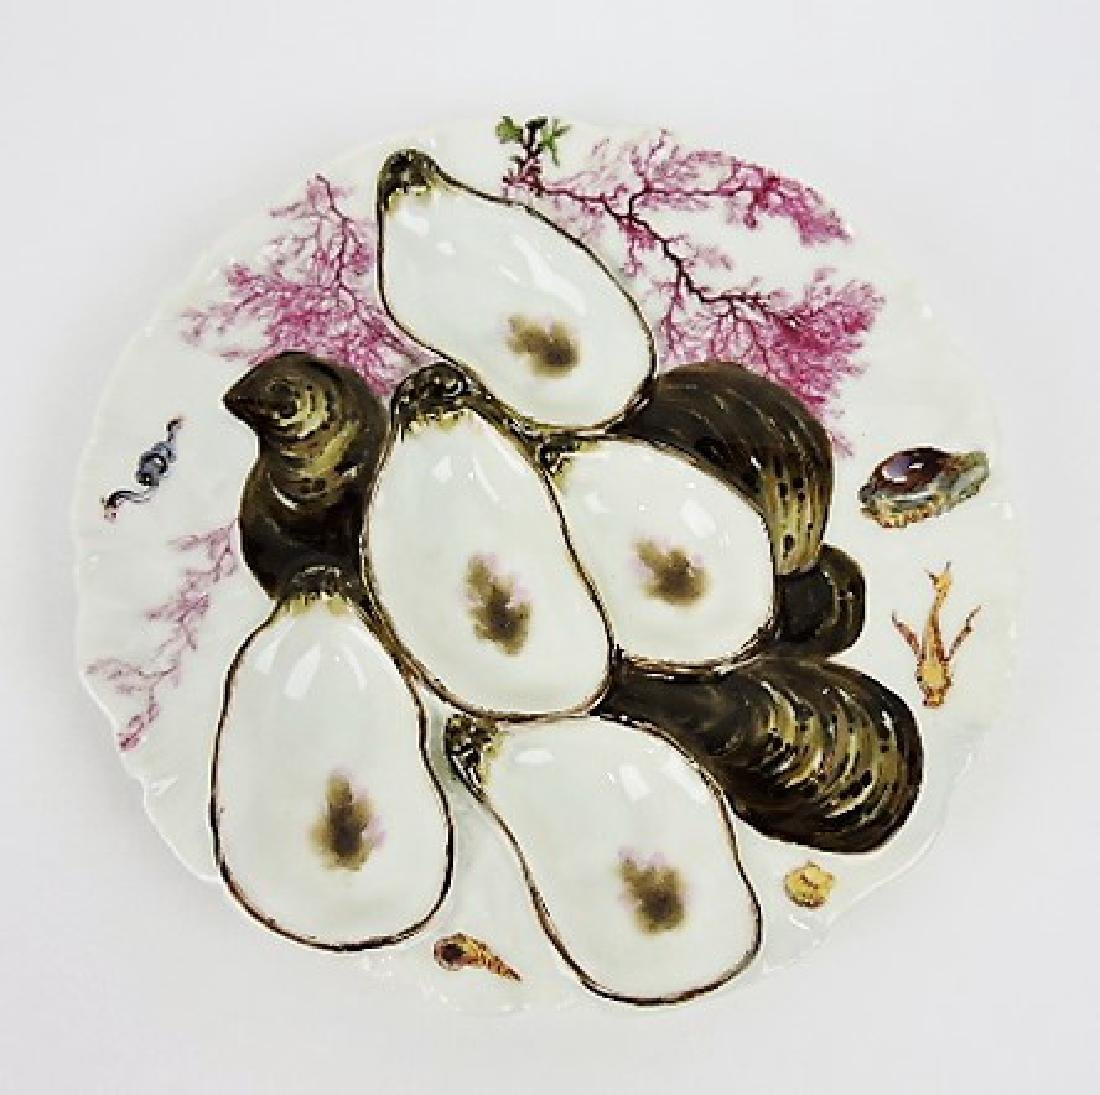 Haviland & Co turkey style oyster plate, white